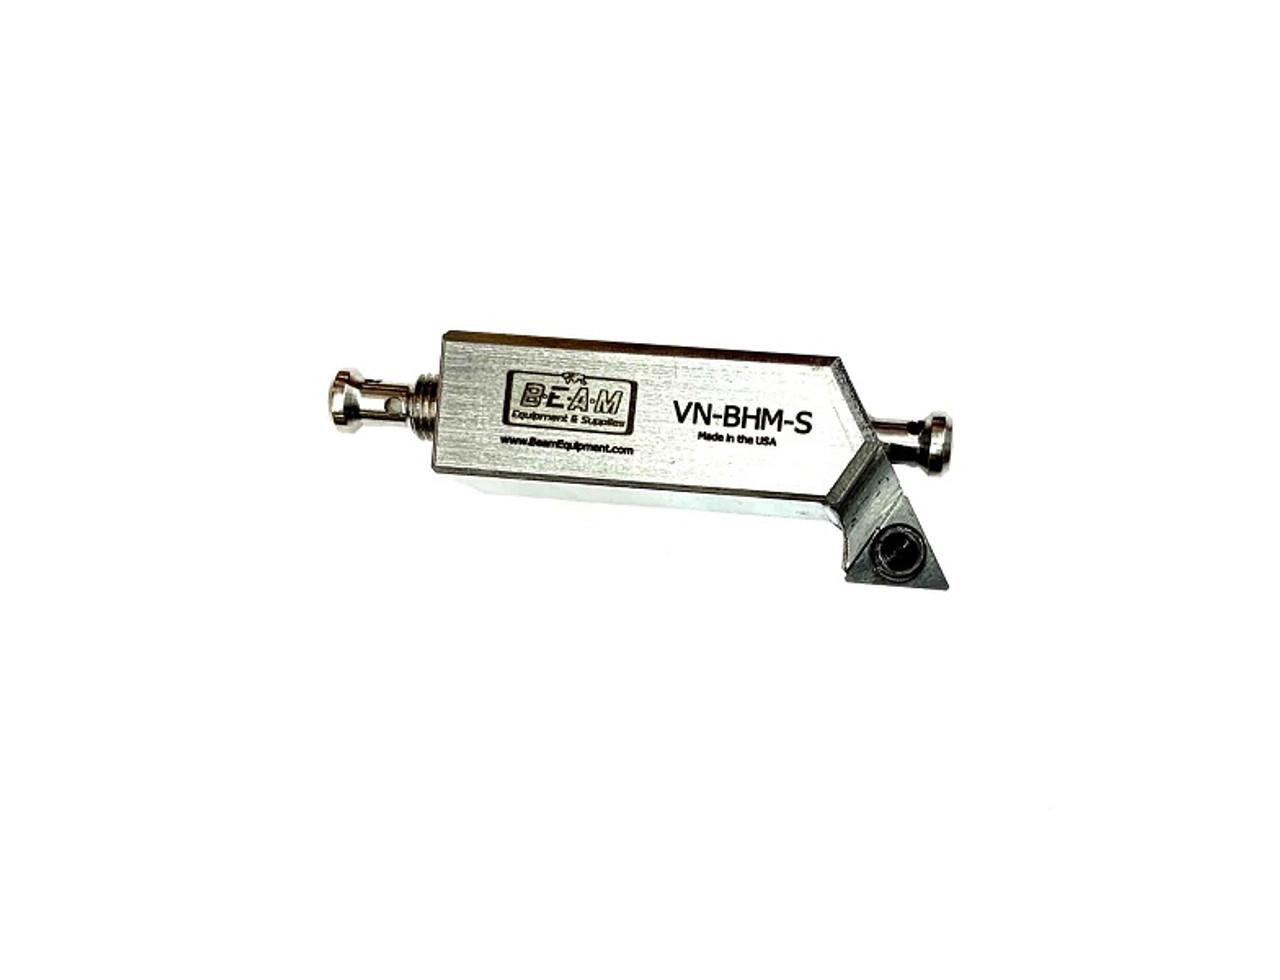 VN-BHM-S - Medium Tool Holder - Blind Hole Boring